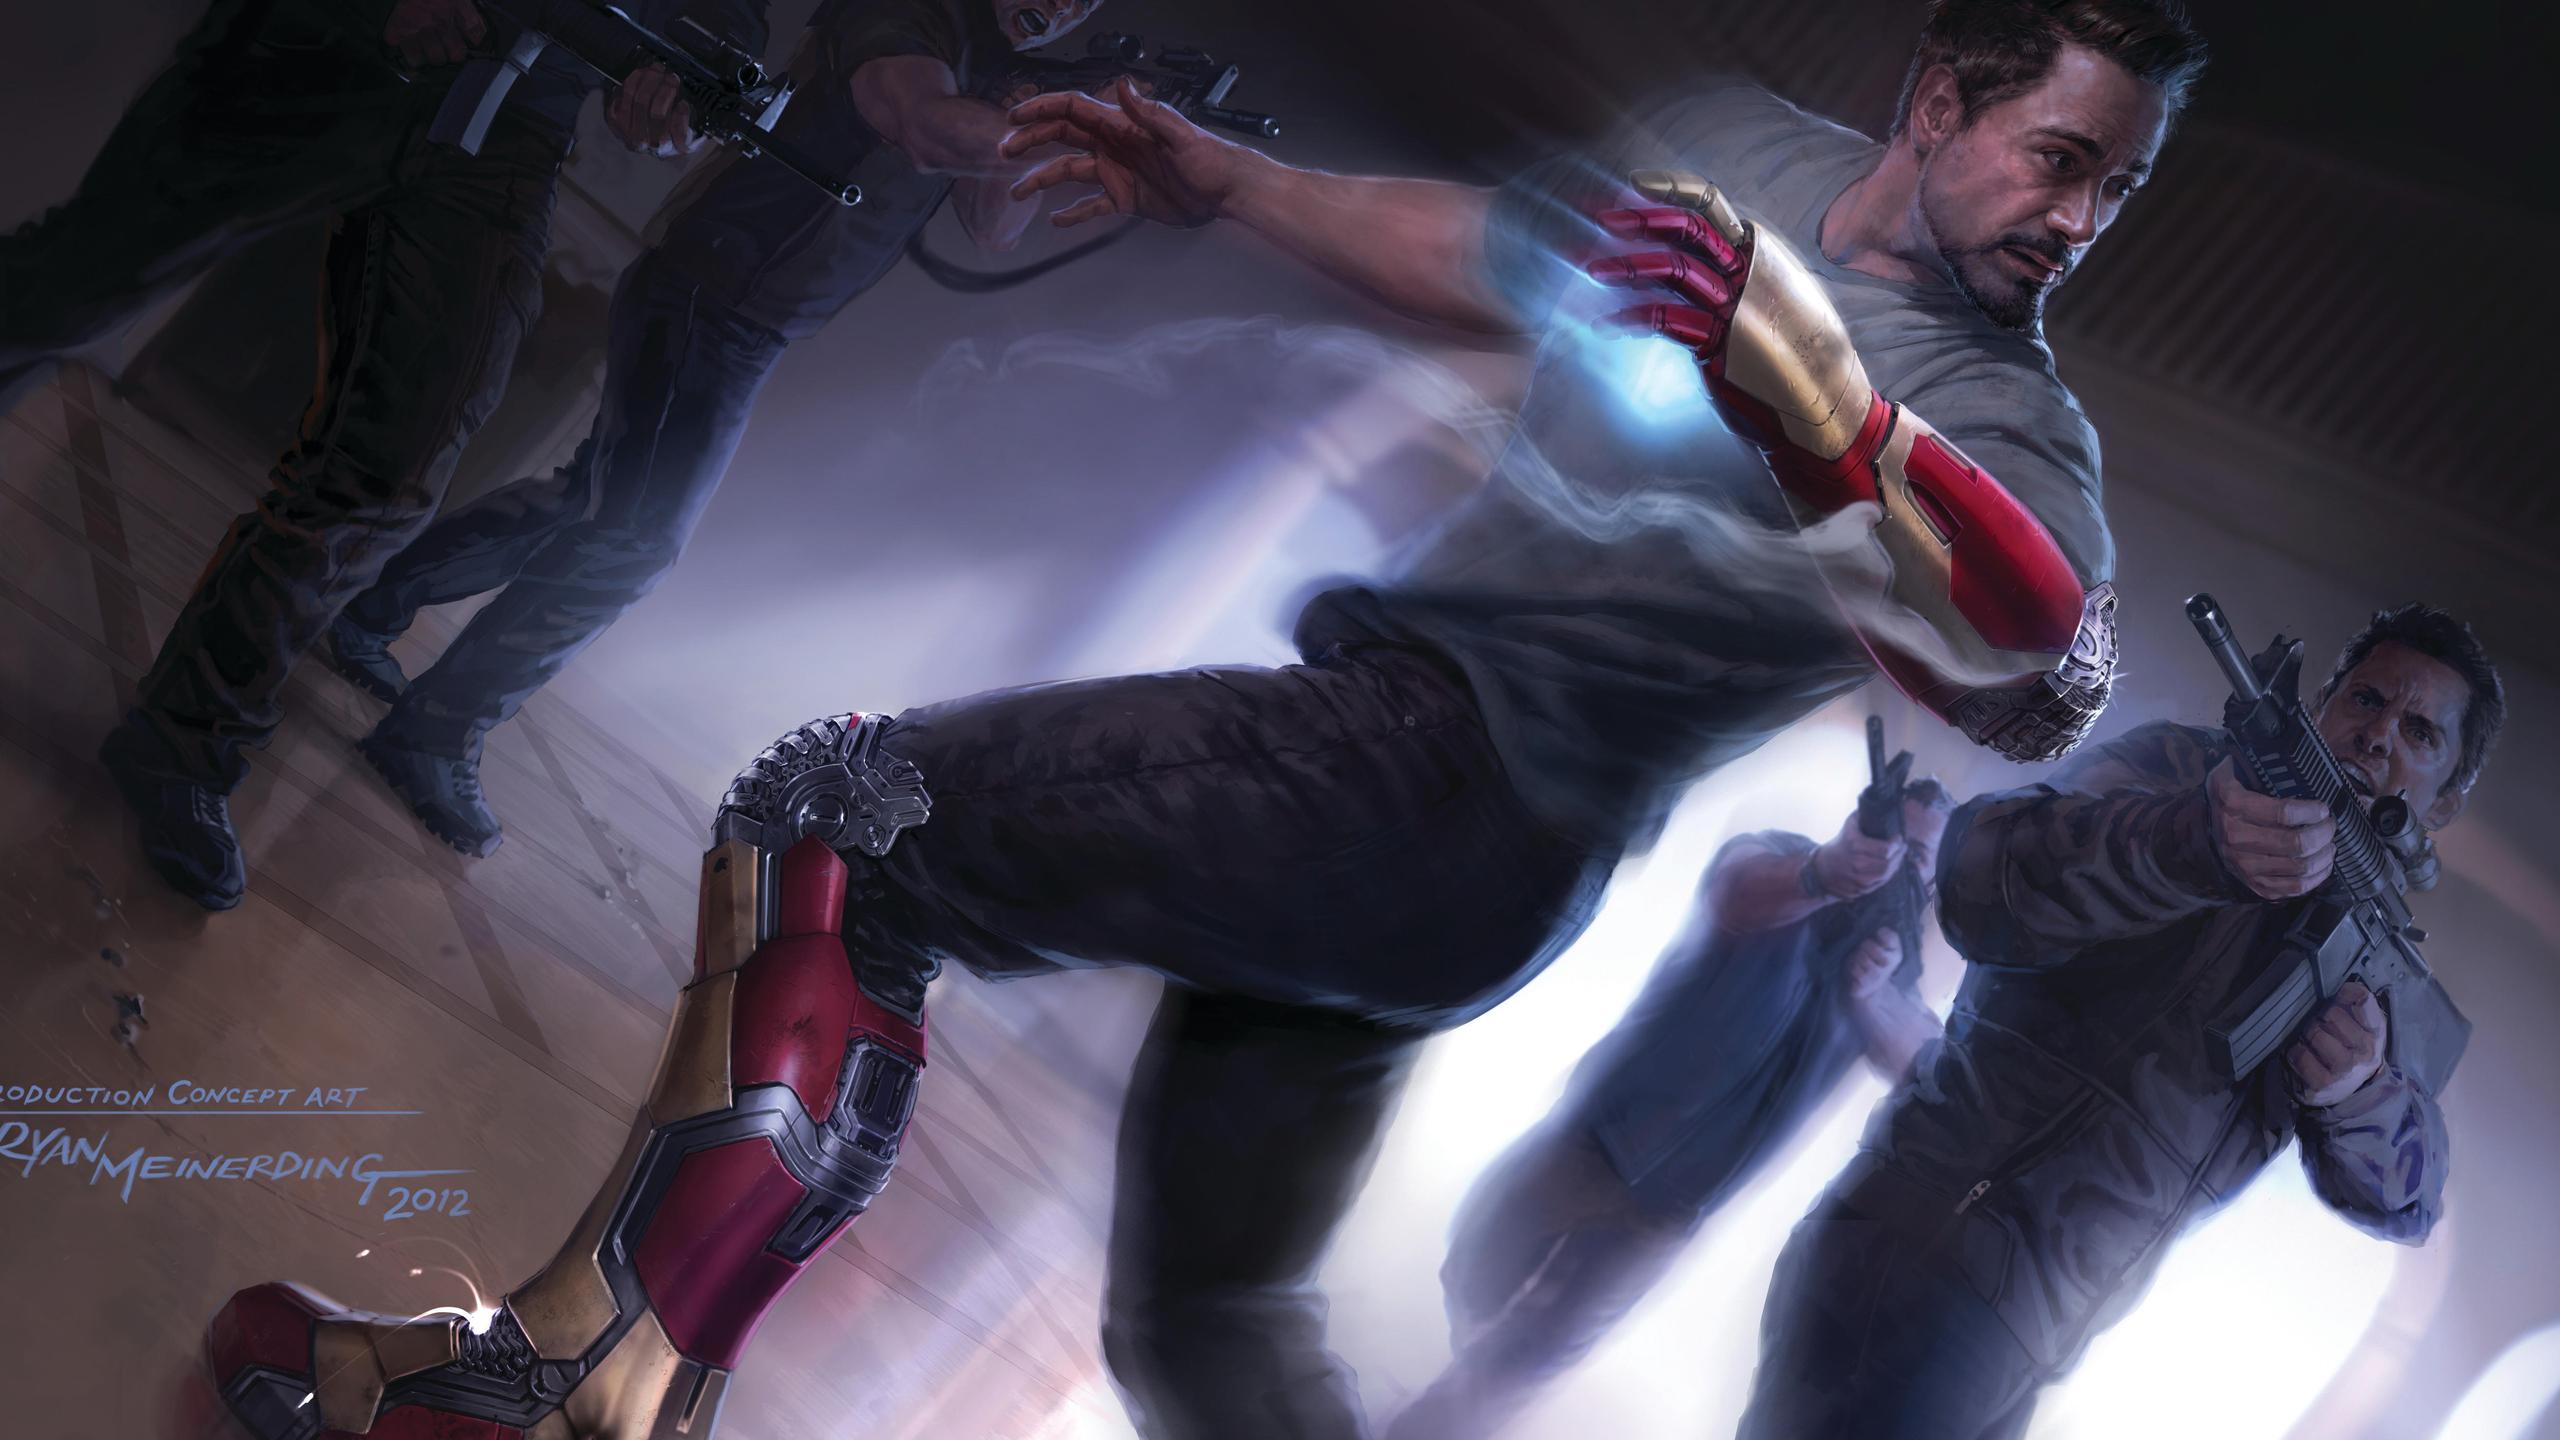 tony-stark-as-iron-man-artwork-5k-he.jpg